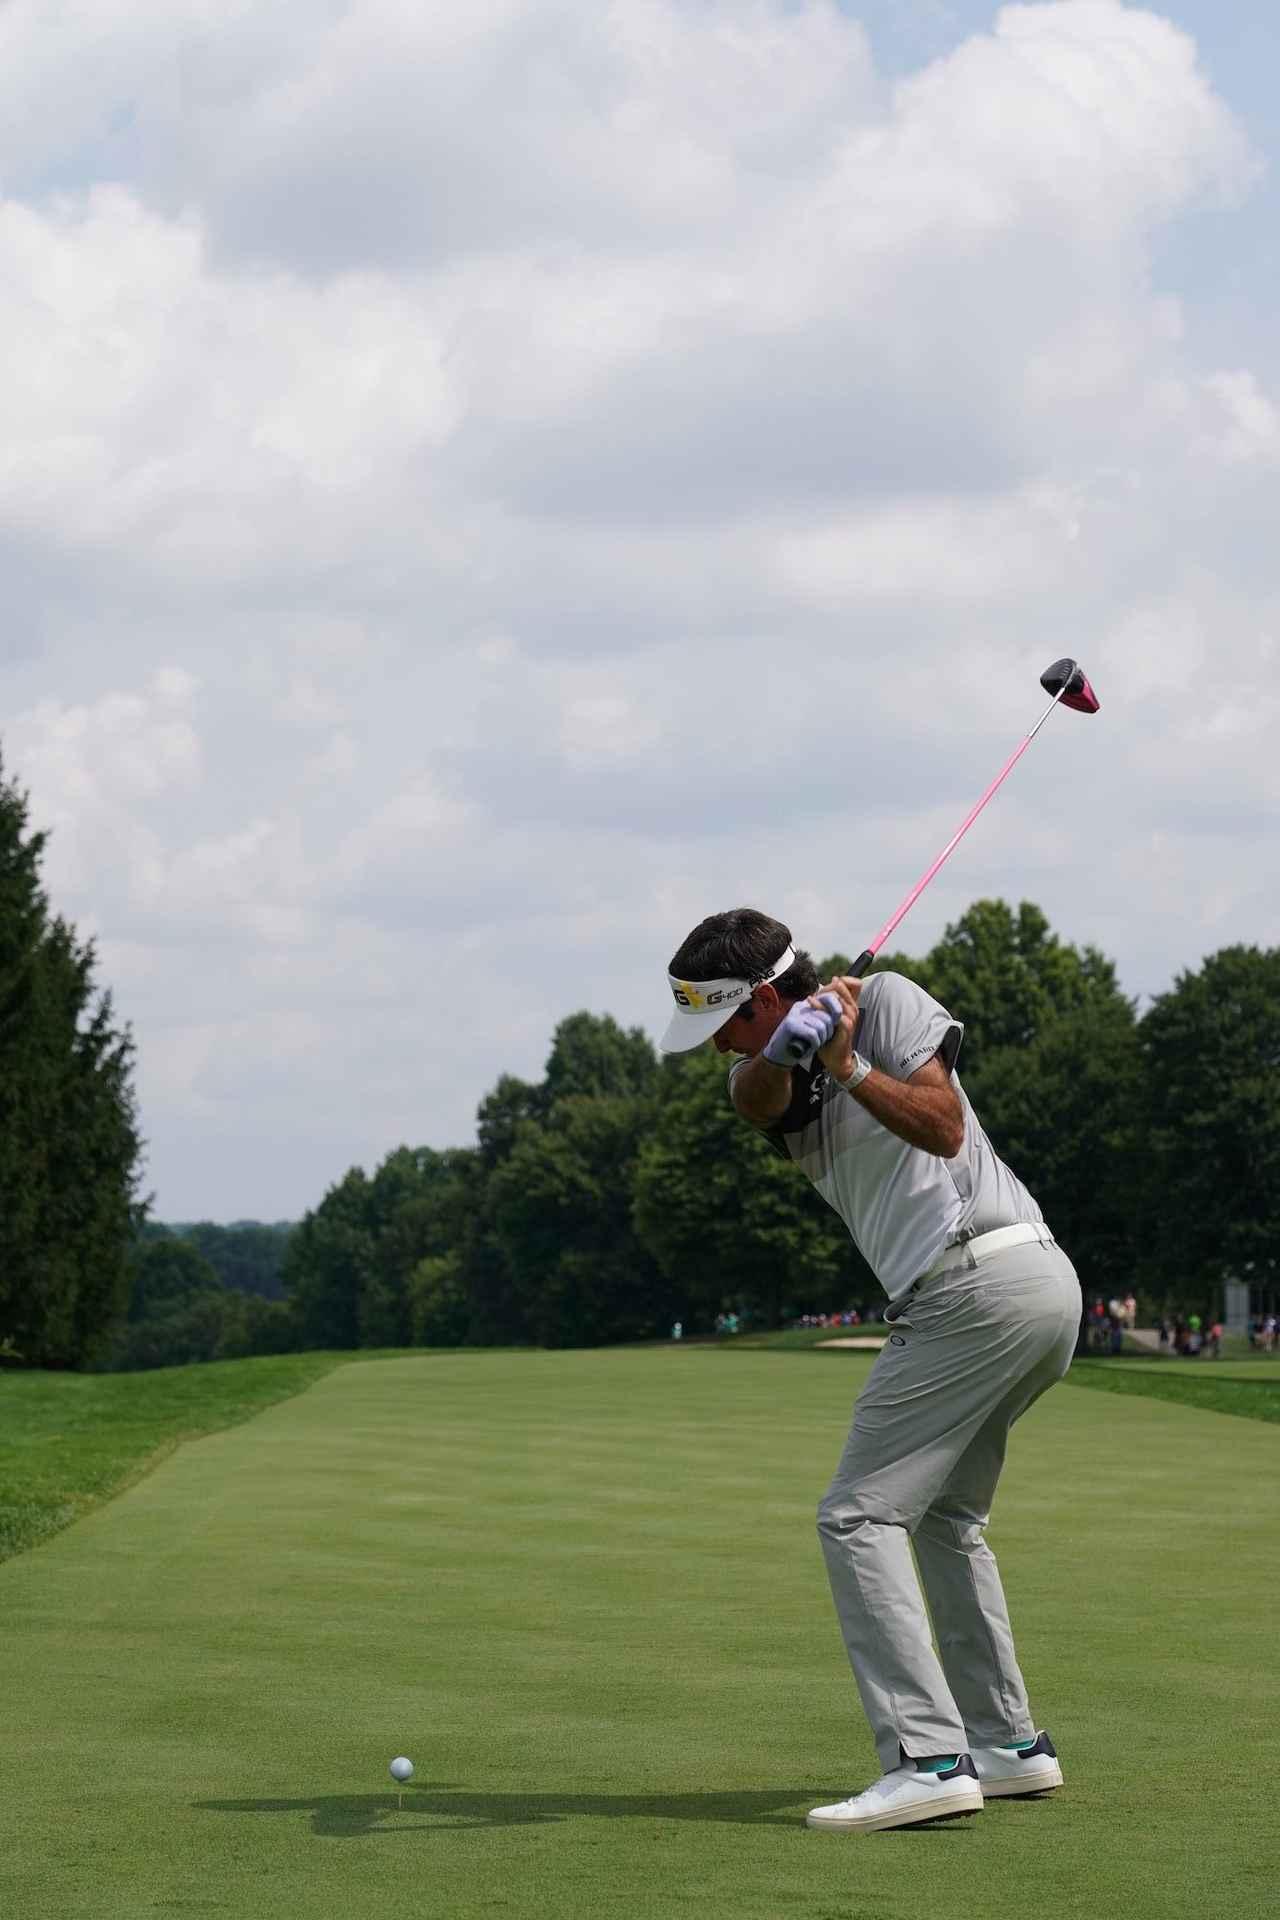 Images : 14番目の画像 - 強烈! バッバ・ワトソンのドライバーショット - みんなのゴルフダイジェスト